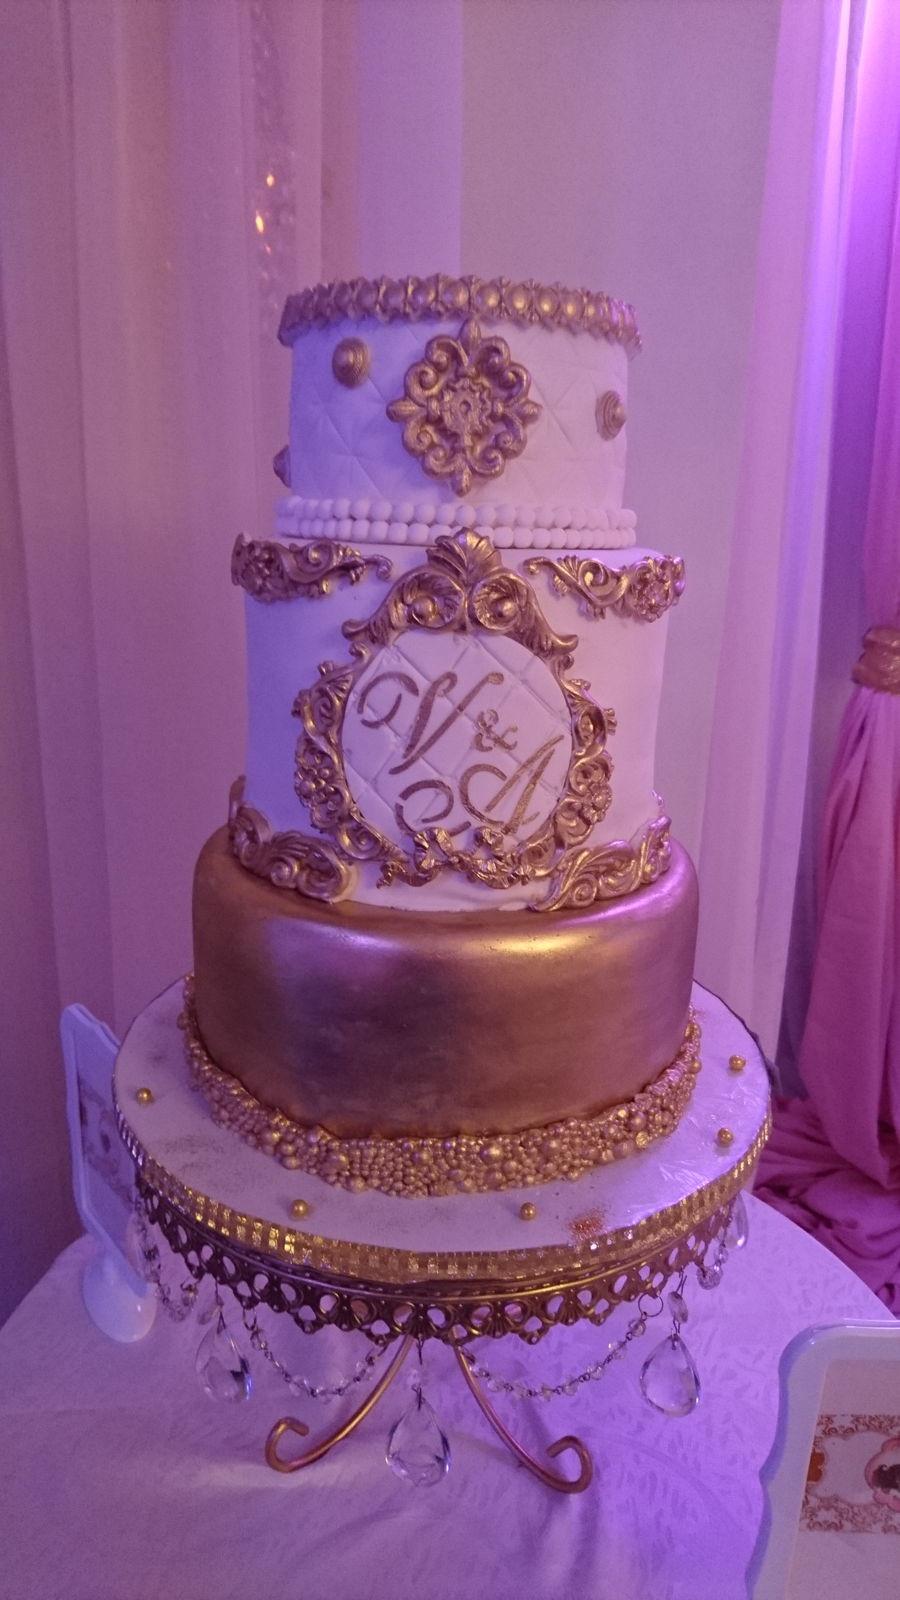 White And Gold Wedding Cakes  Elegant Baroque Vintage White & Gold Wedding Cake